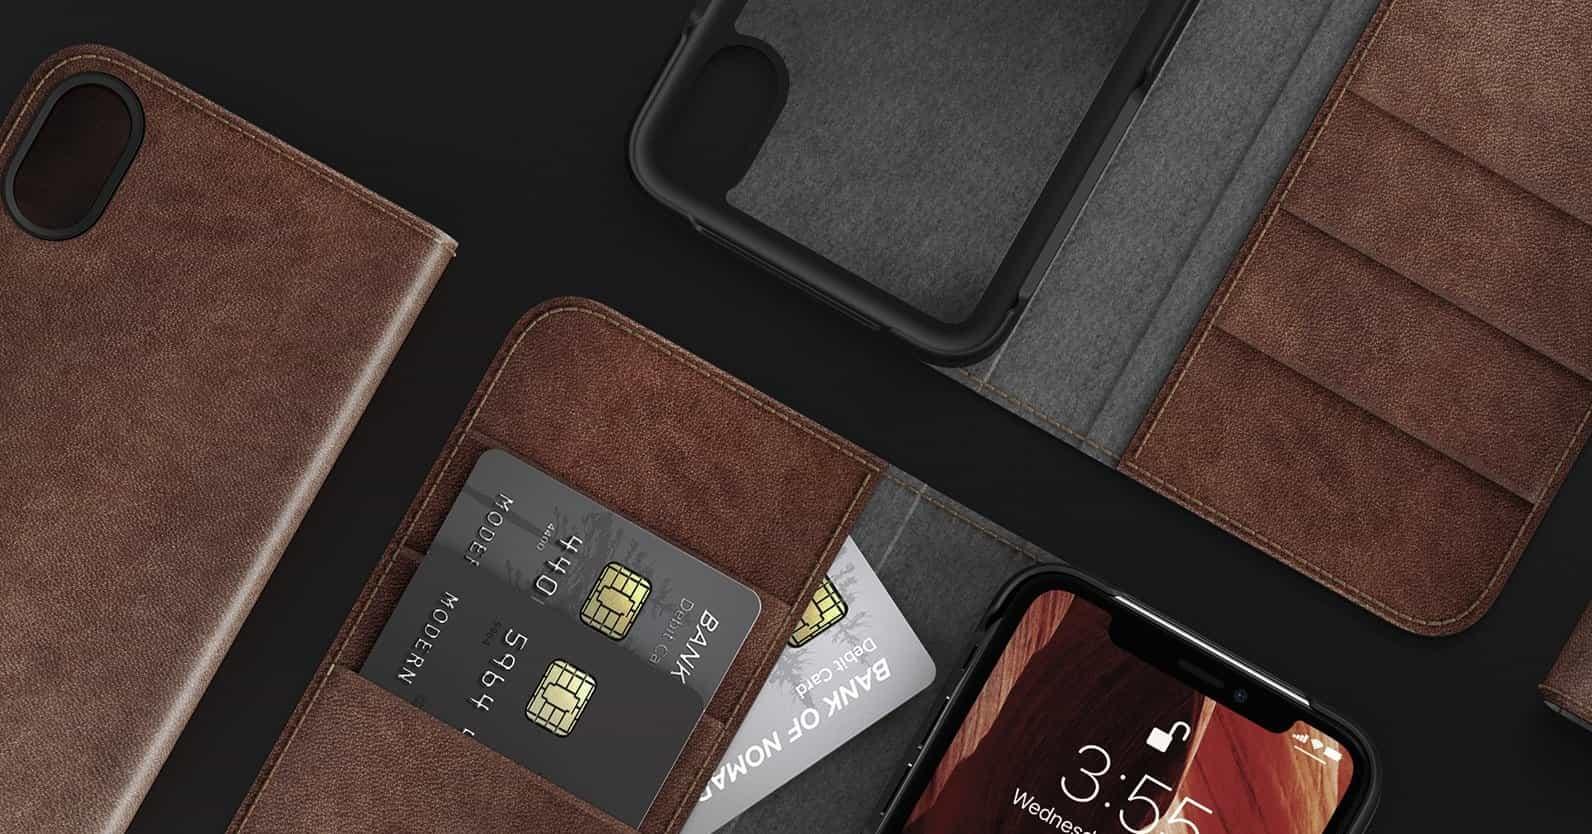 Nomad iPhone Case BestBuy